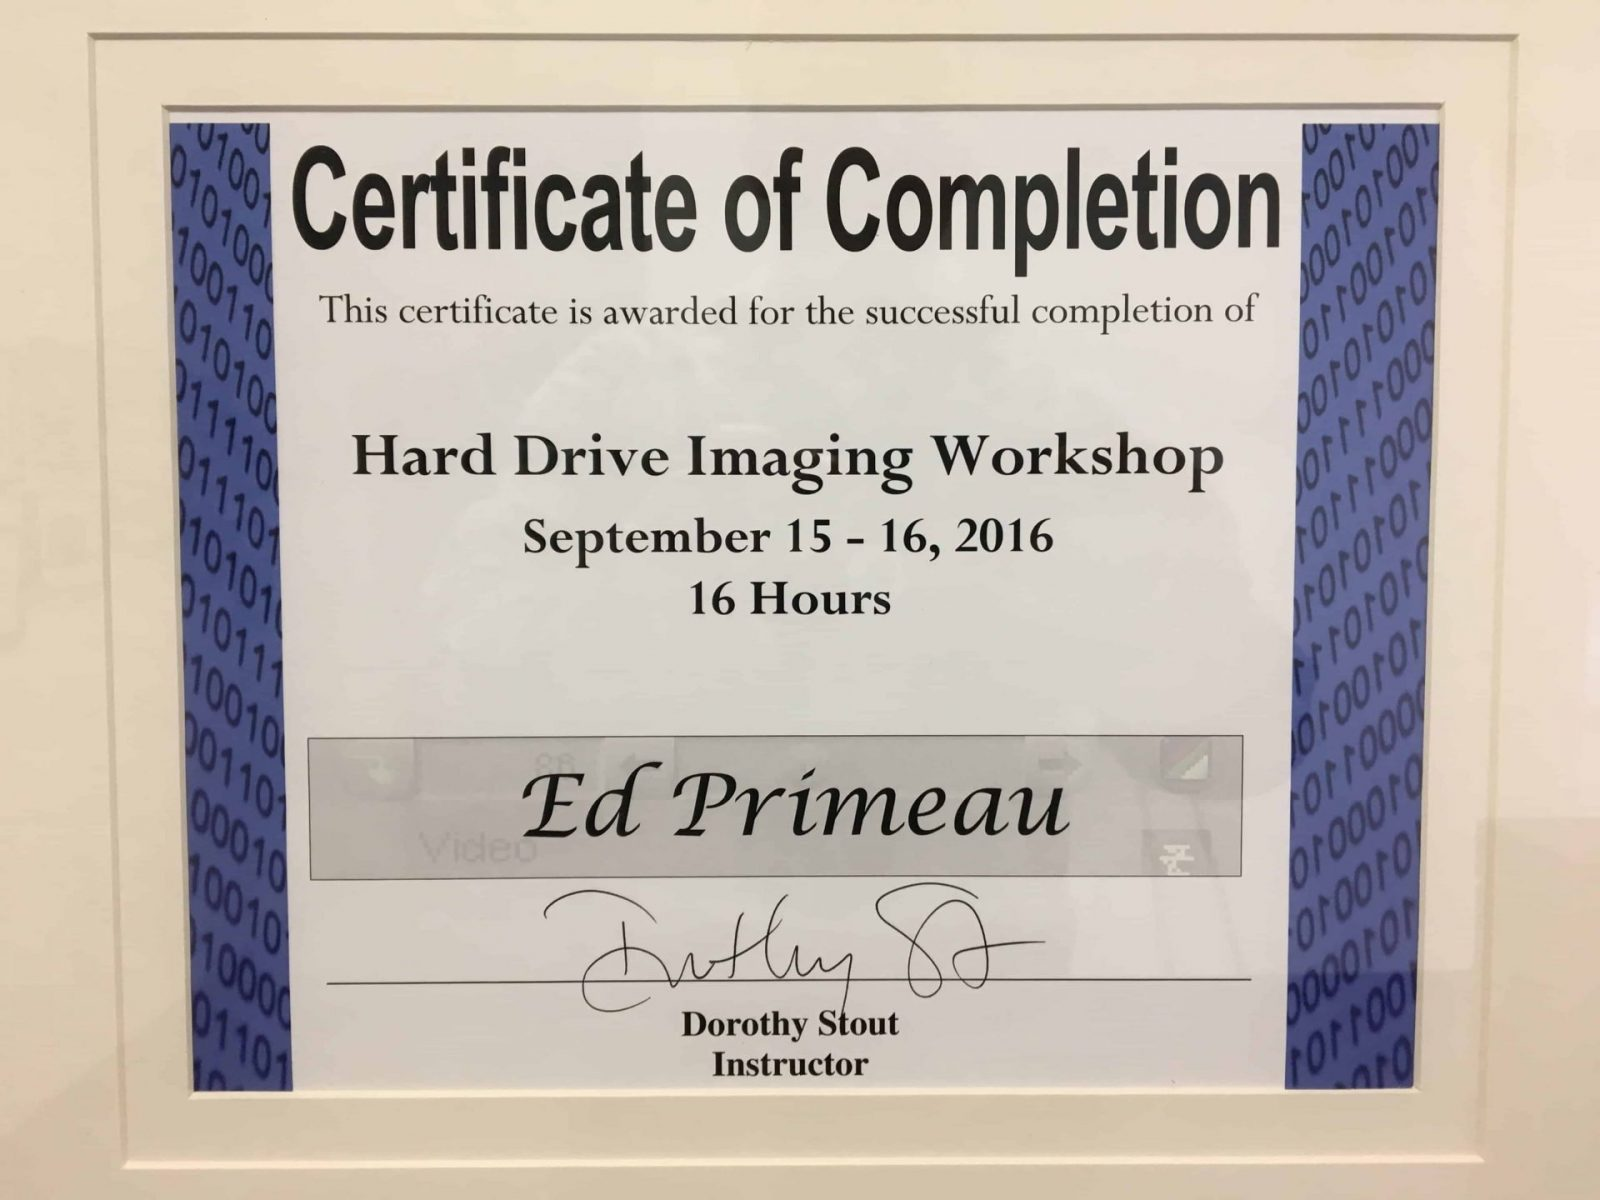 Hard-Drive-Imaging-Workshop-Edward-Primeau Meet Edward Primeau, CCI, CFC